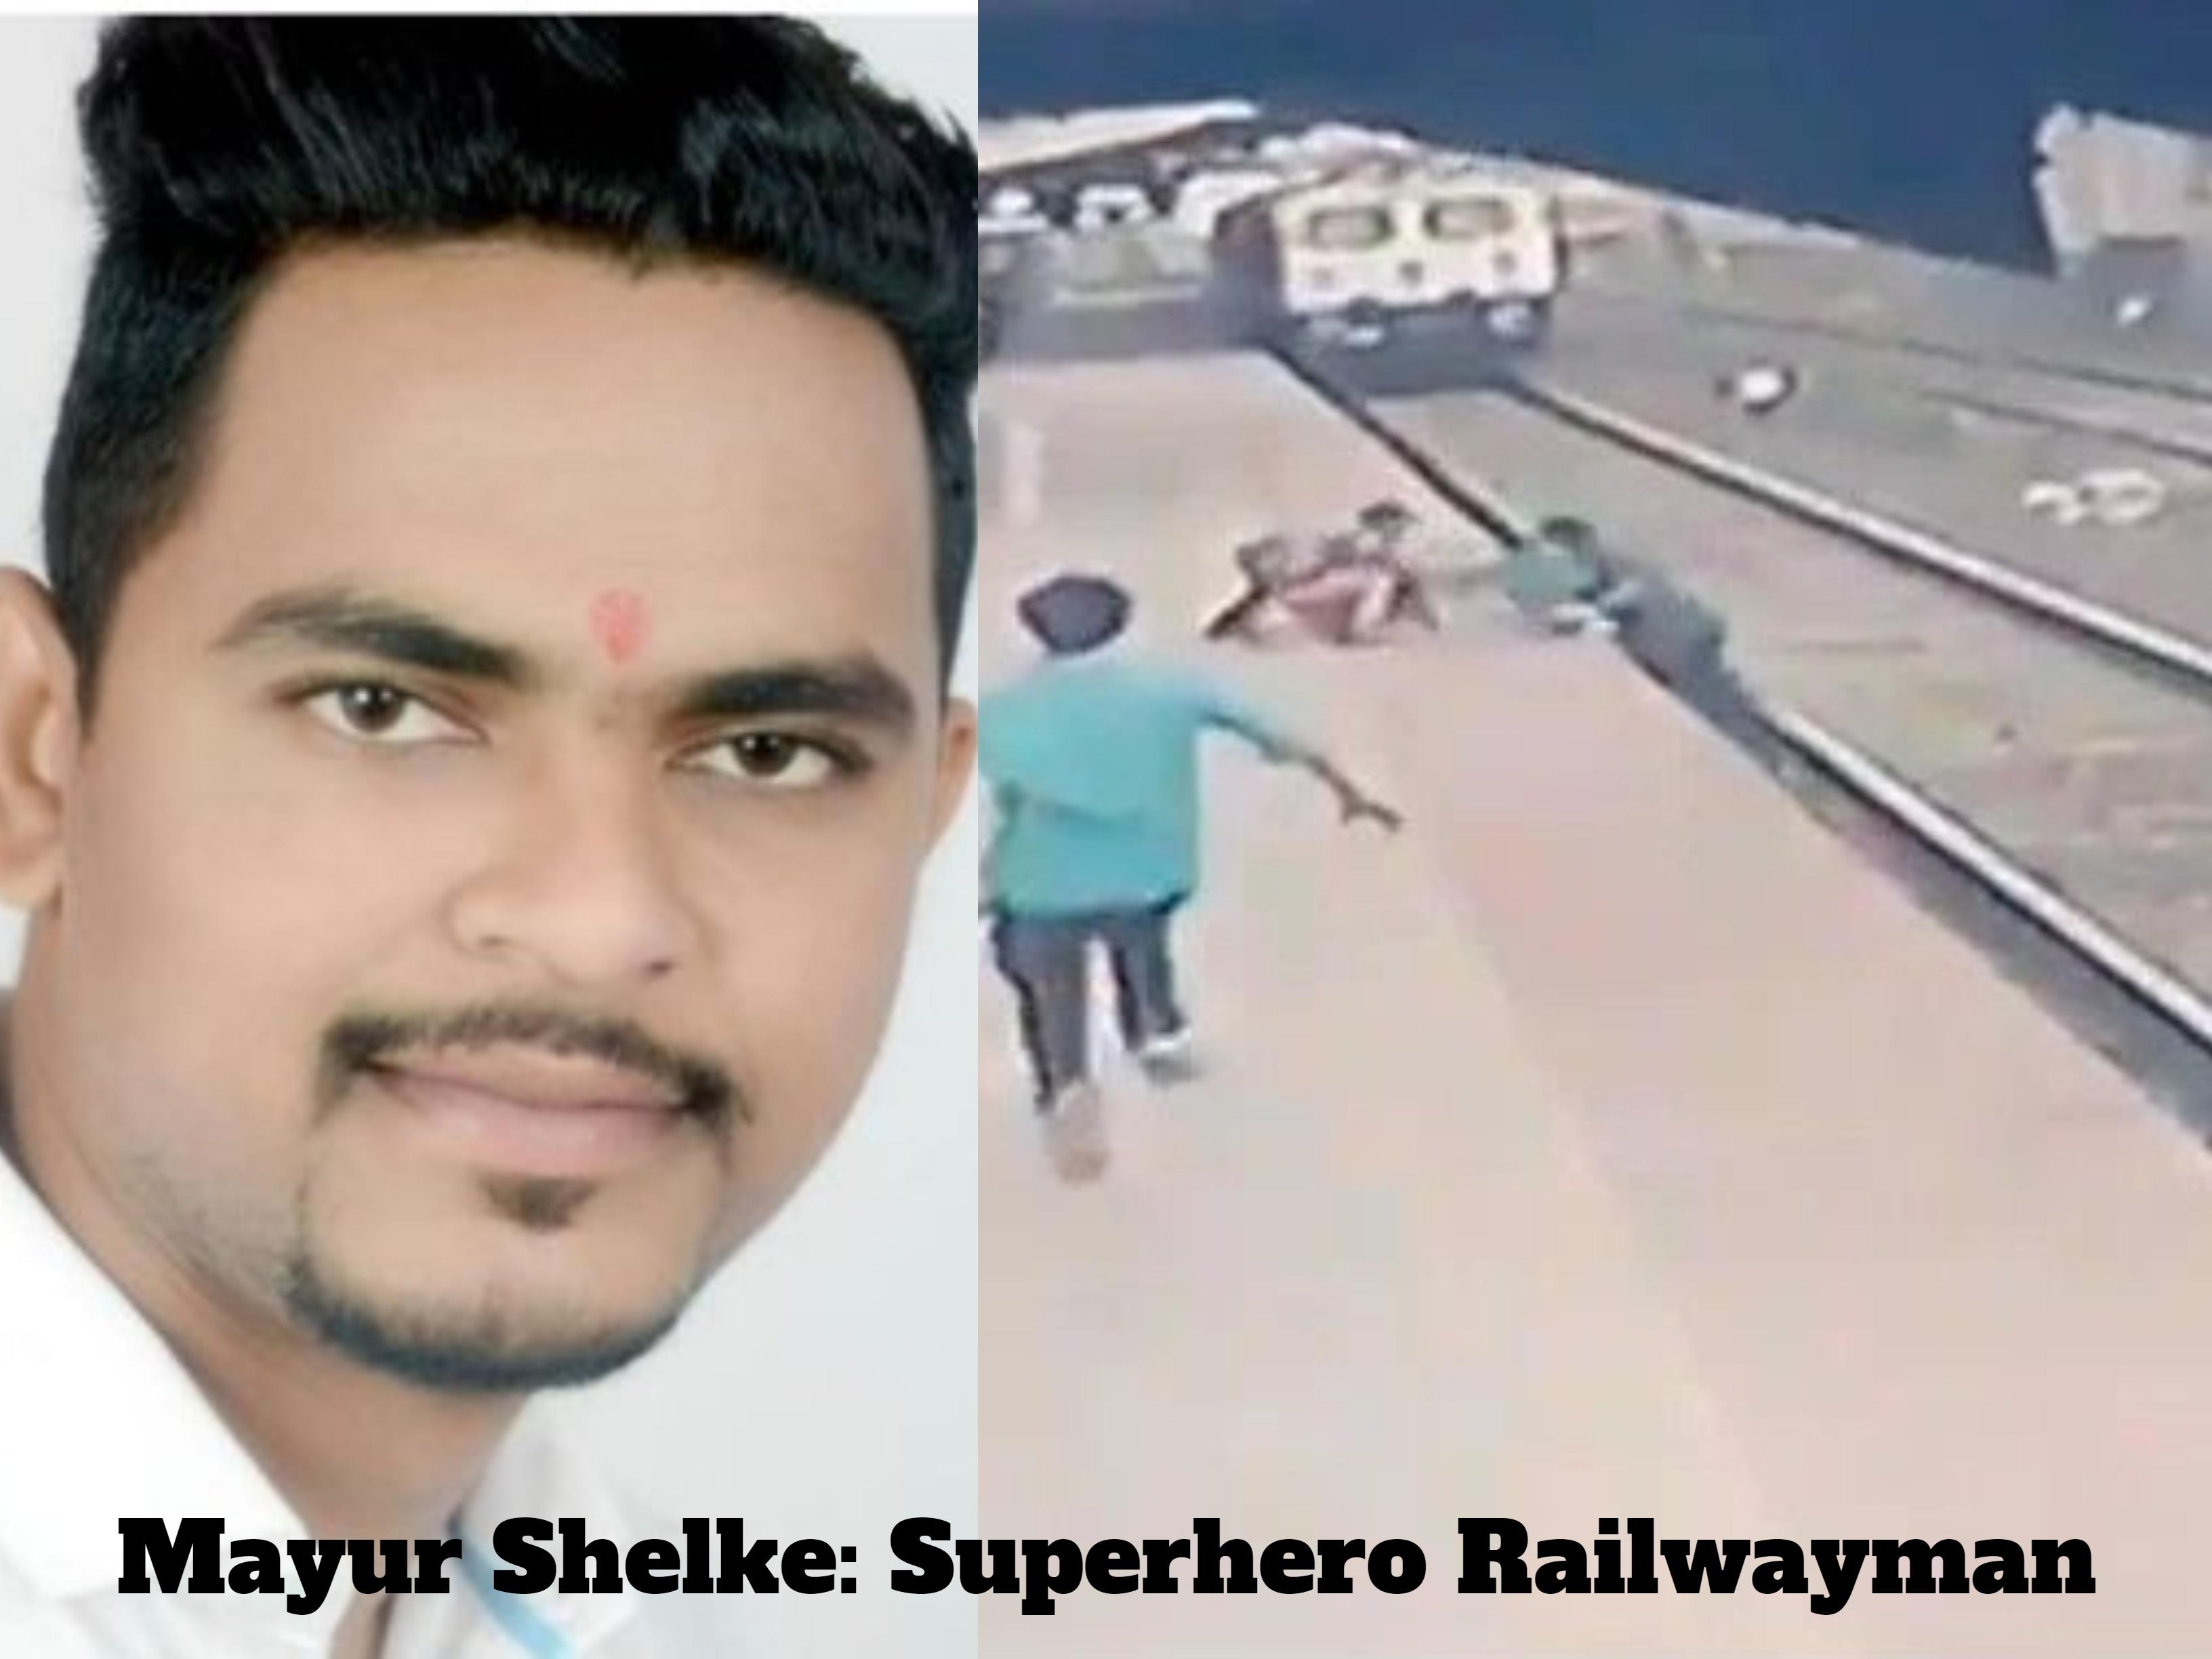 Superhero Railwayman Saves A Child